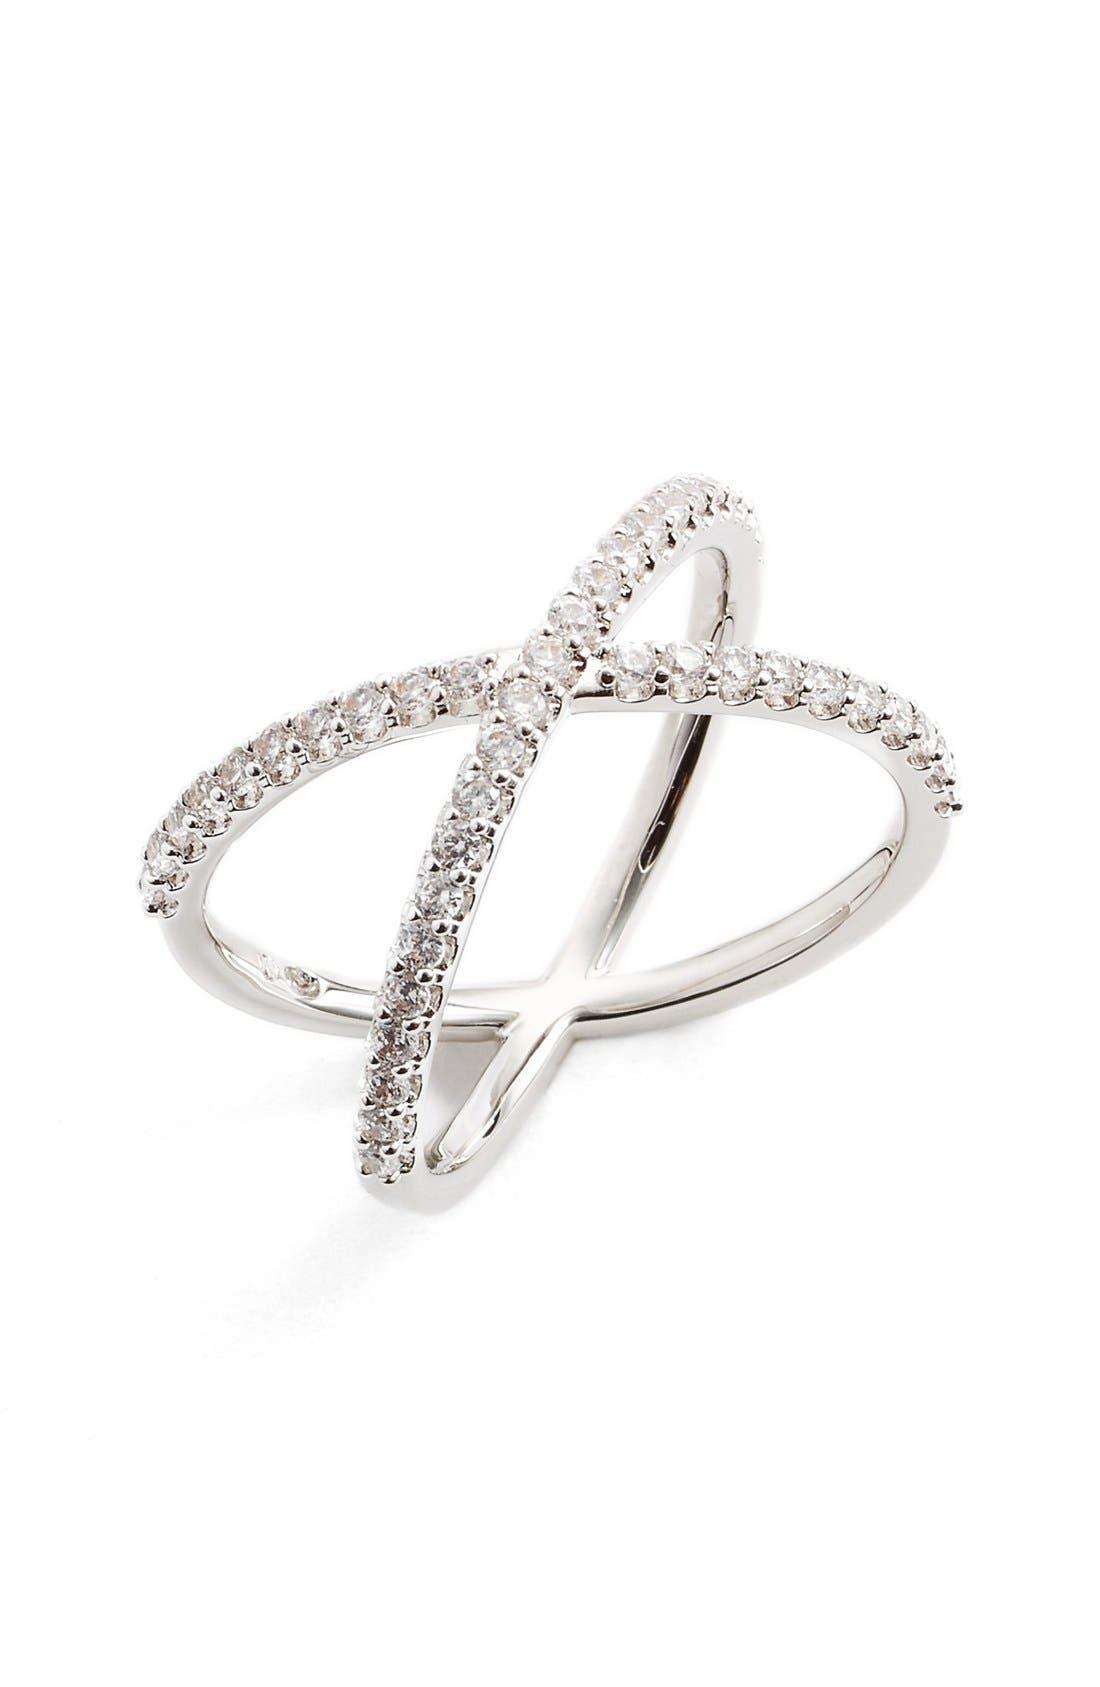 NADRI Crossover Cubic Zirconia Ring, Main, color, 040